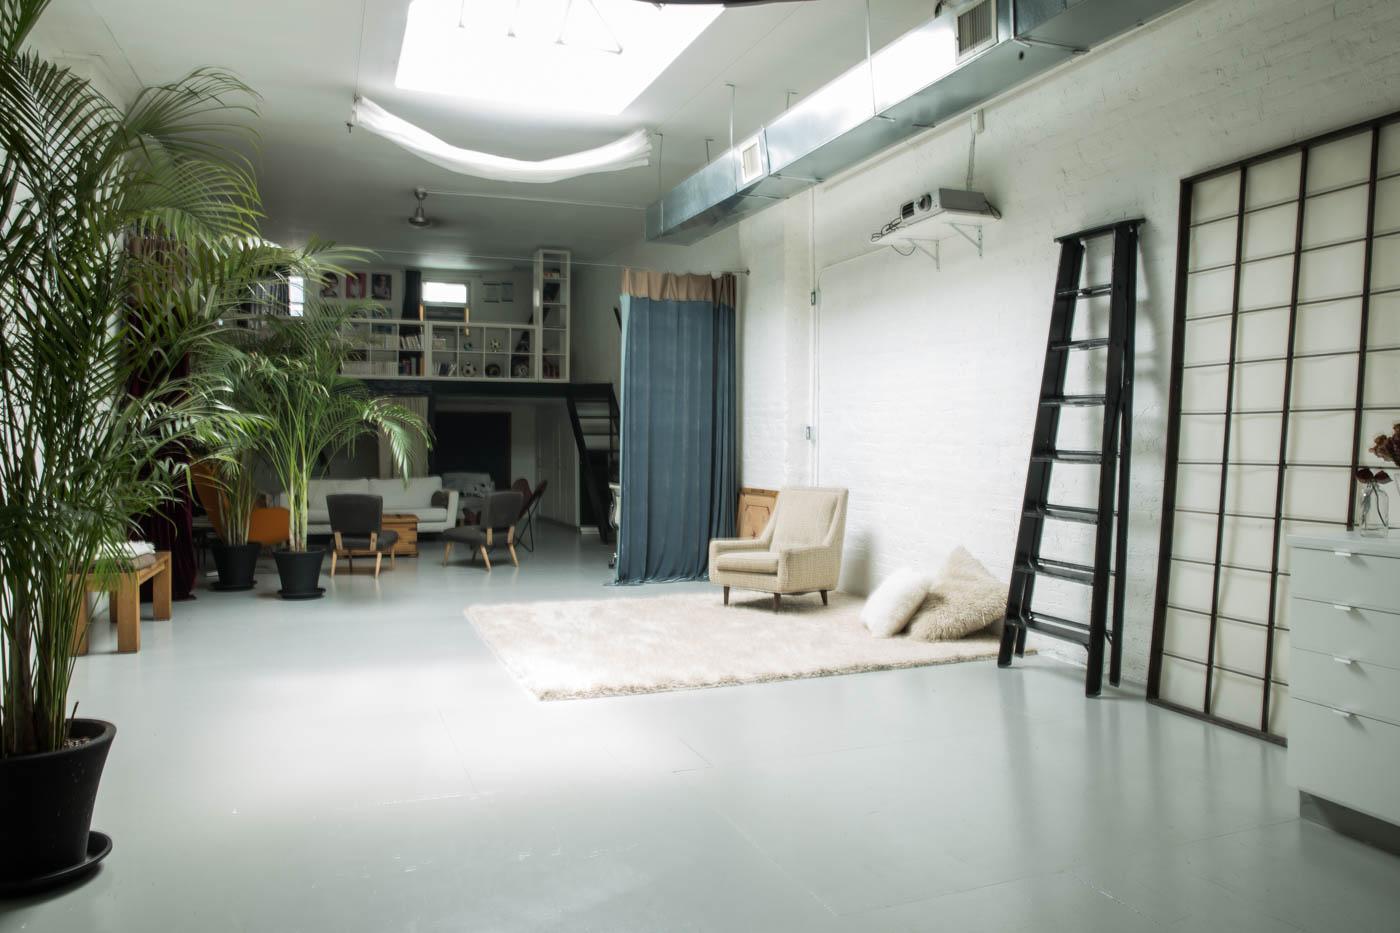 sackett studio-14.jpg